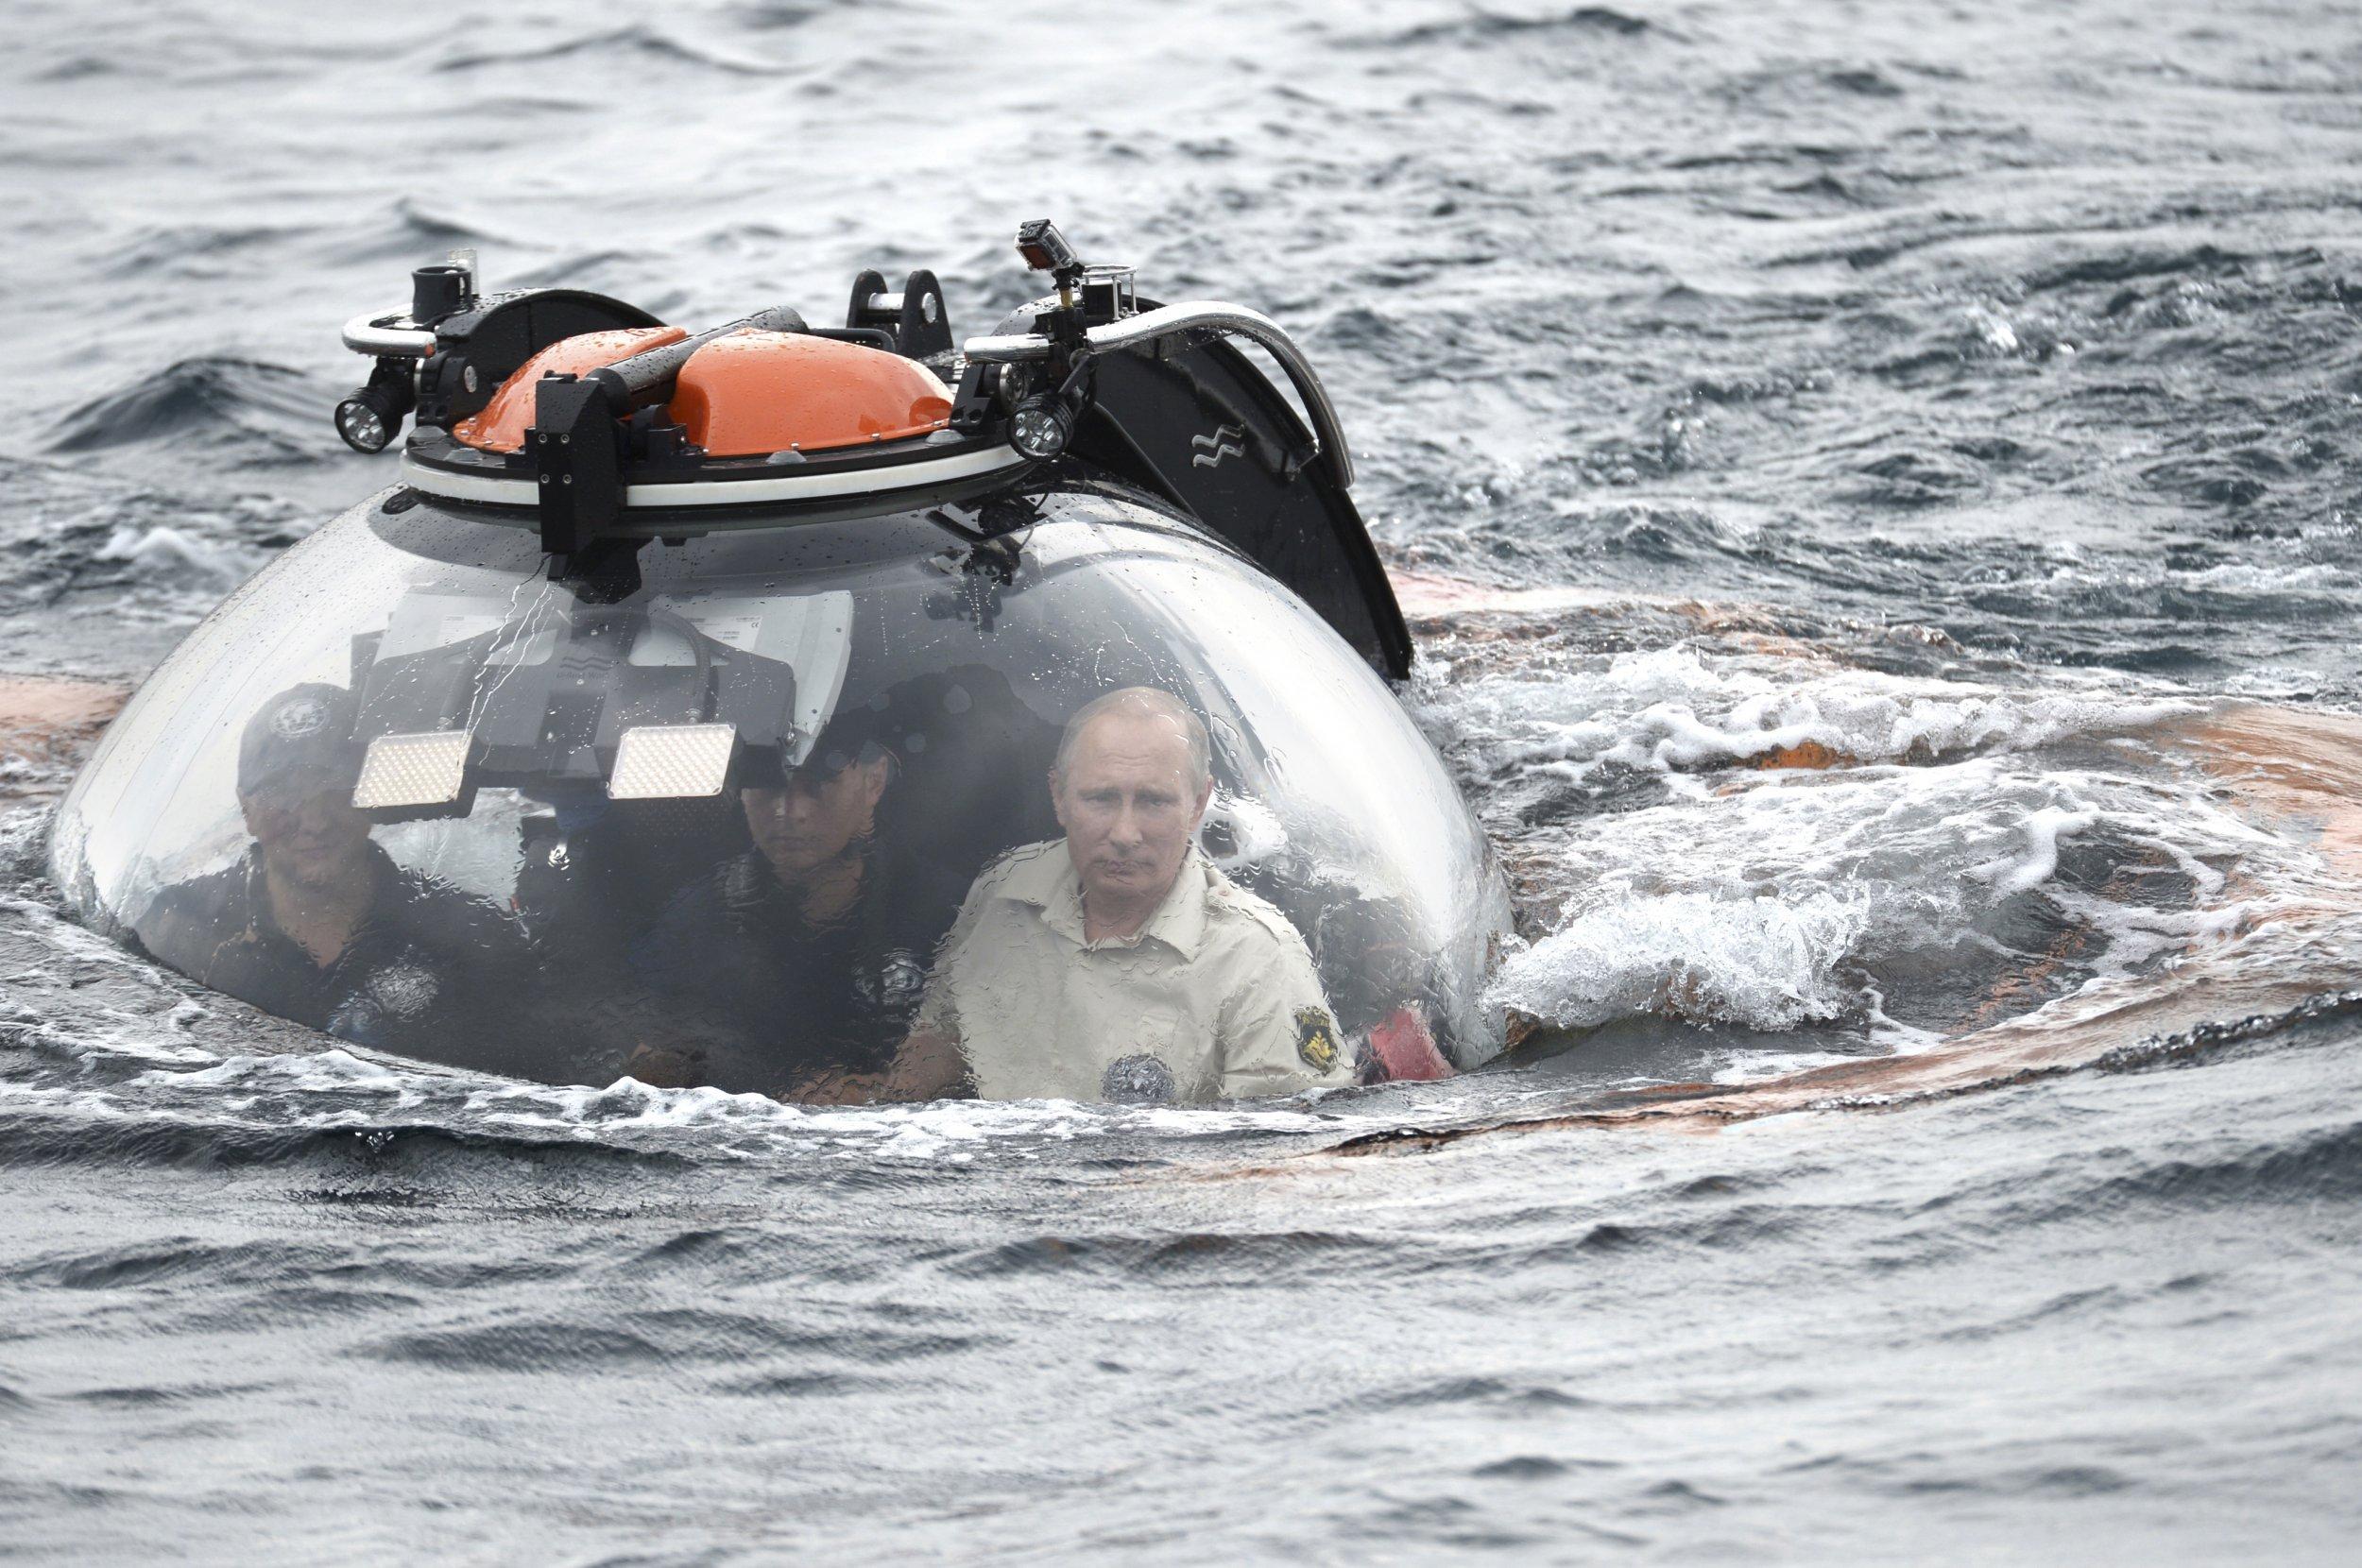 07_03_Putin_Black_01